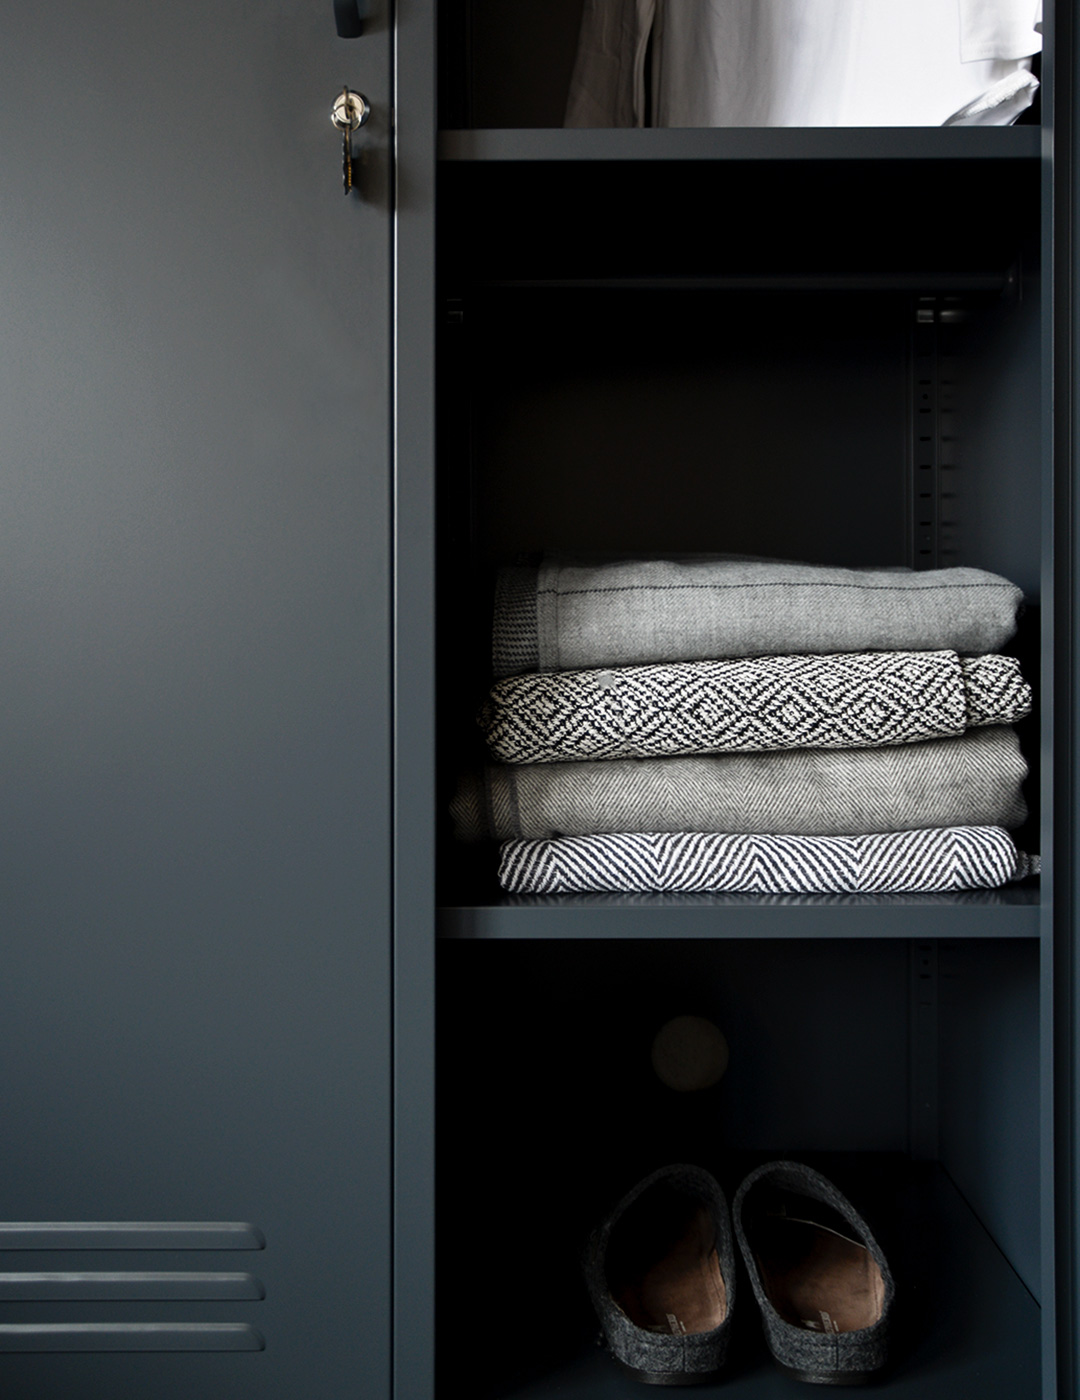 wardrobe metal storage locker in slate grey shown close up with one door open